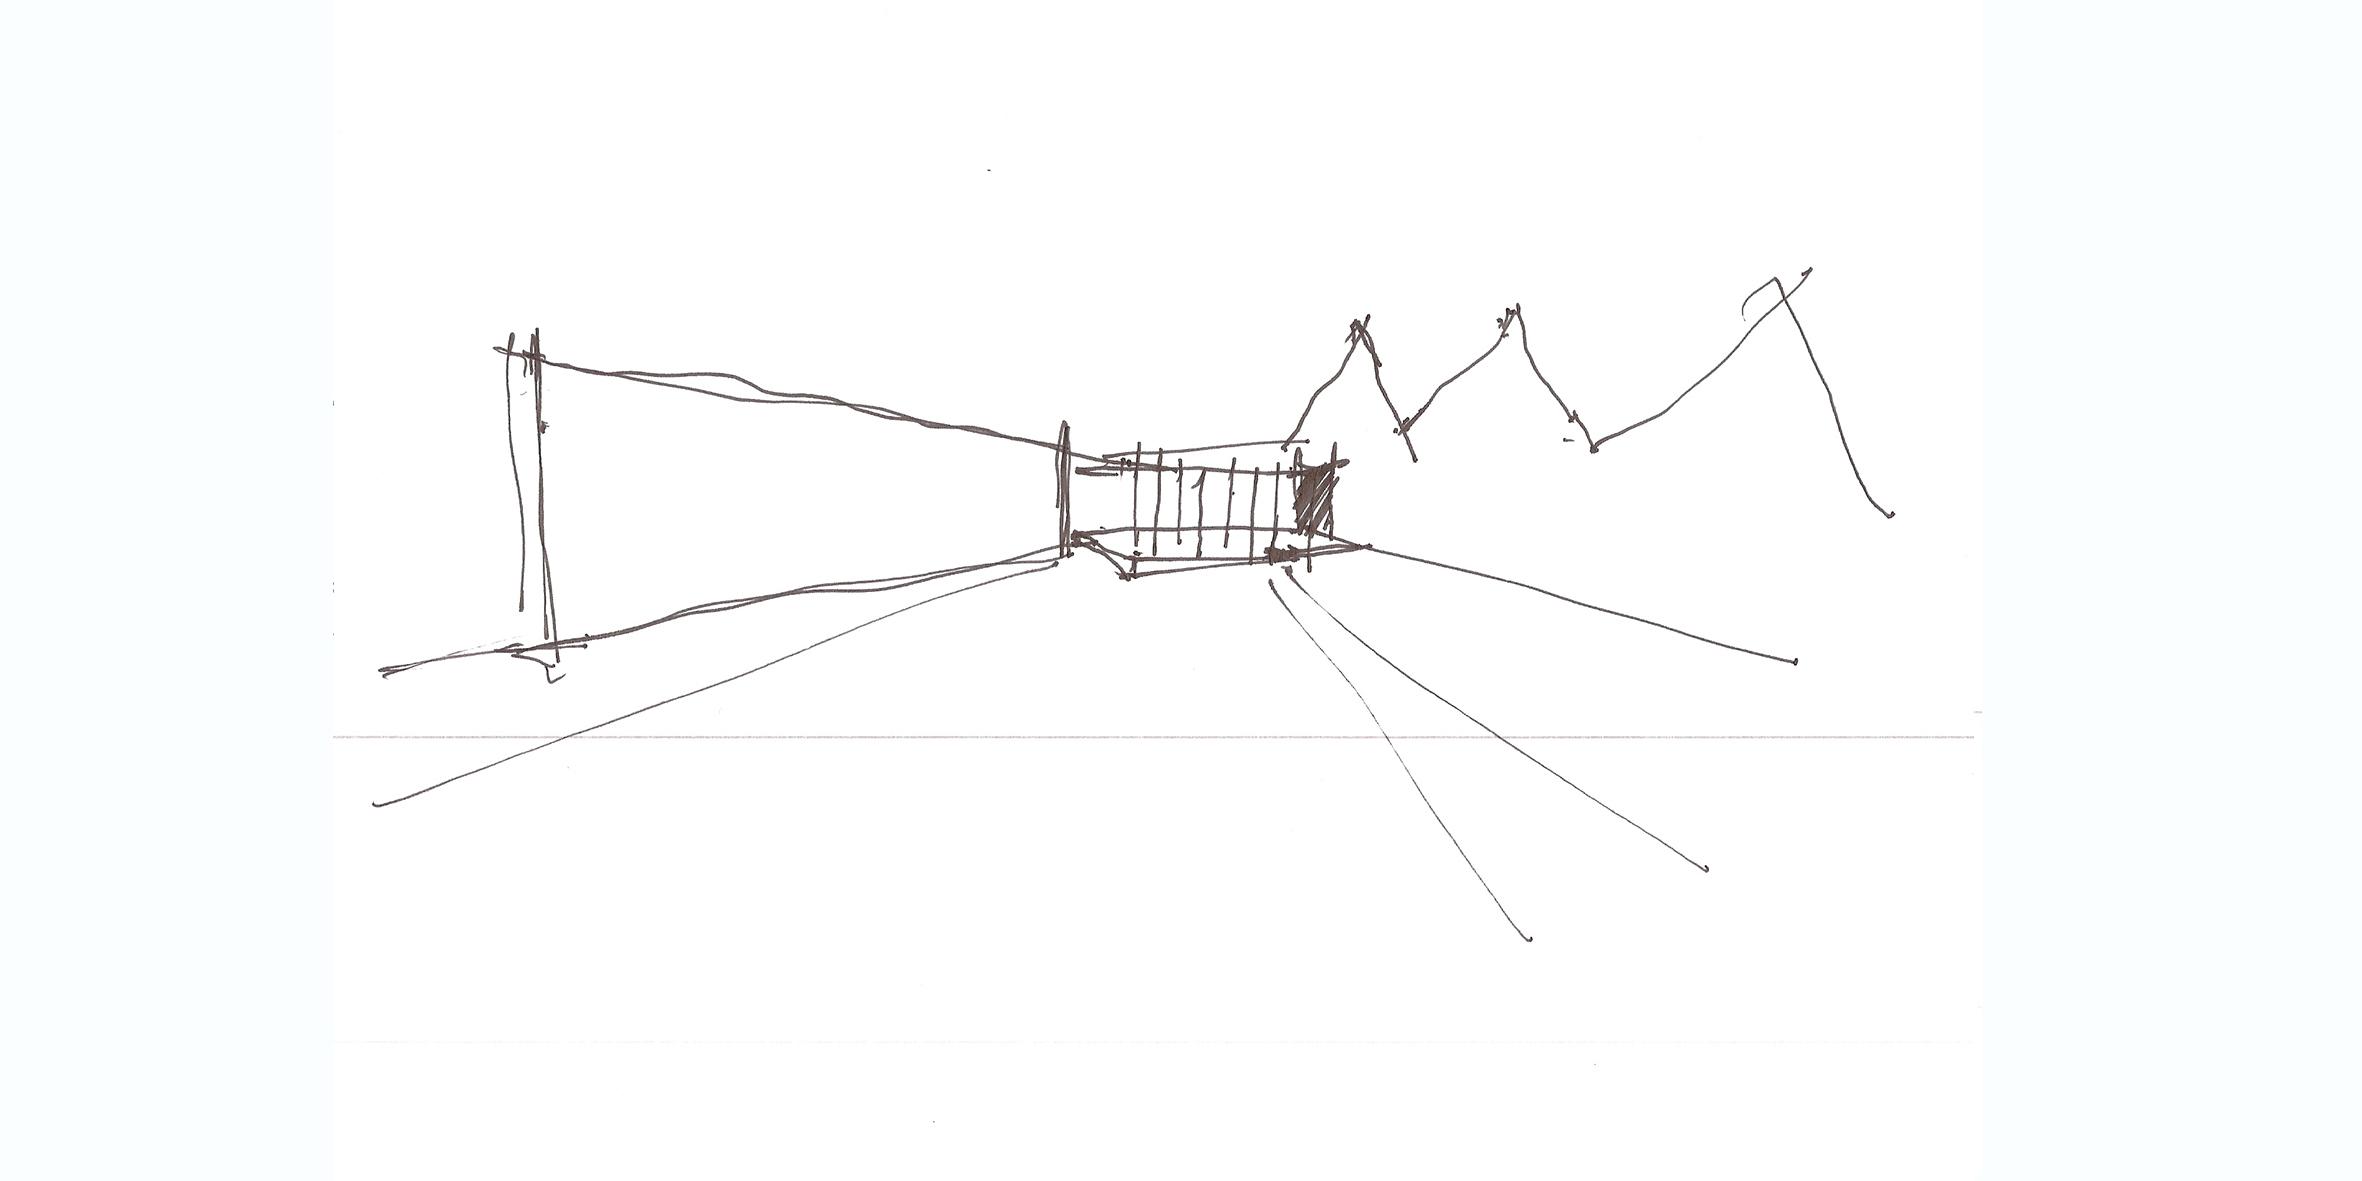 boldan kelder, concept sketch